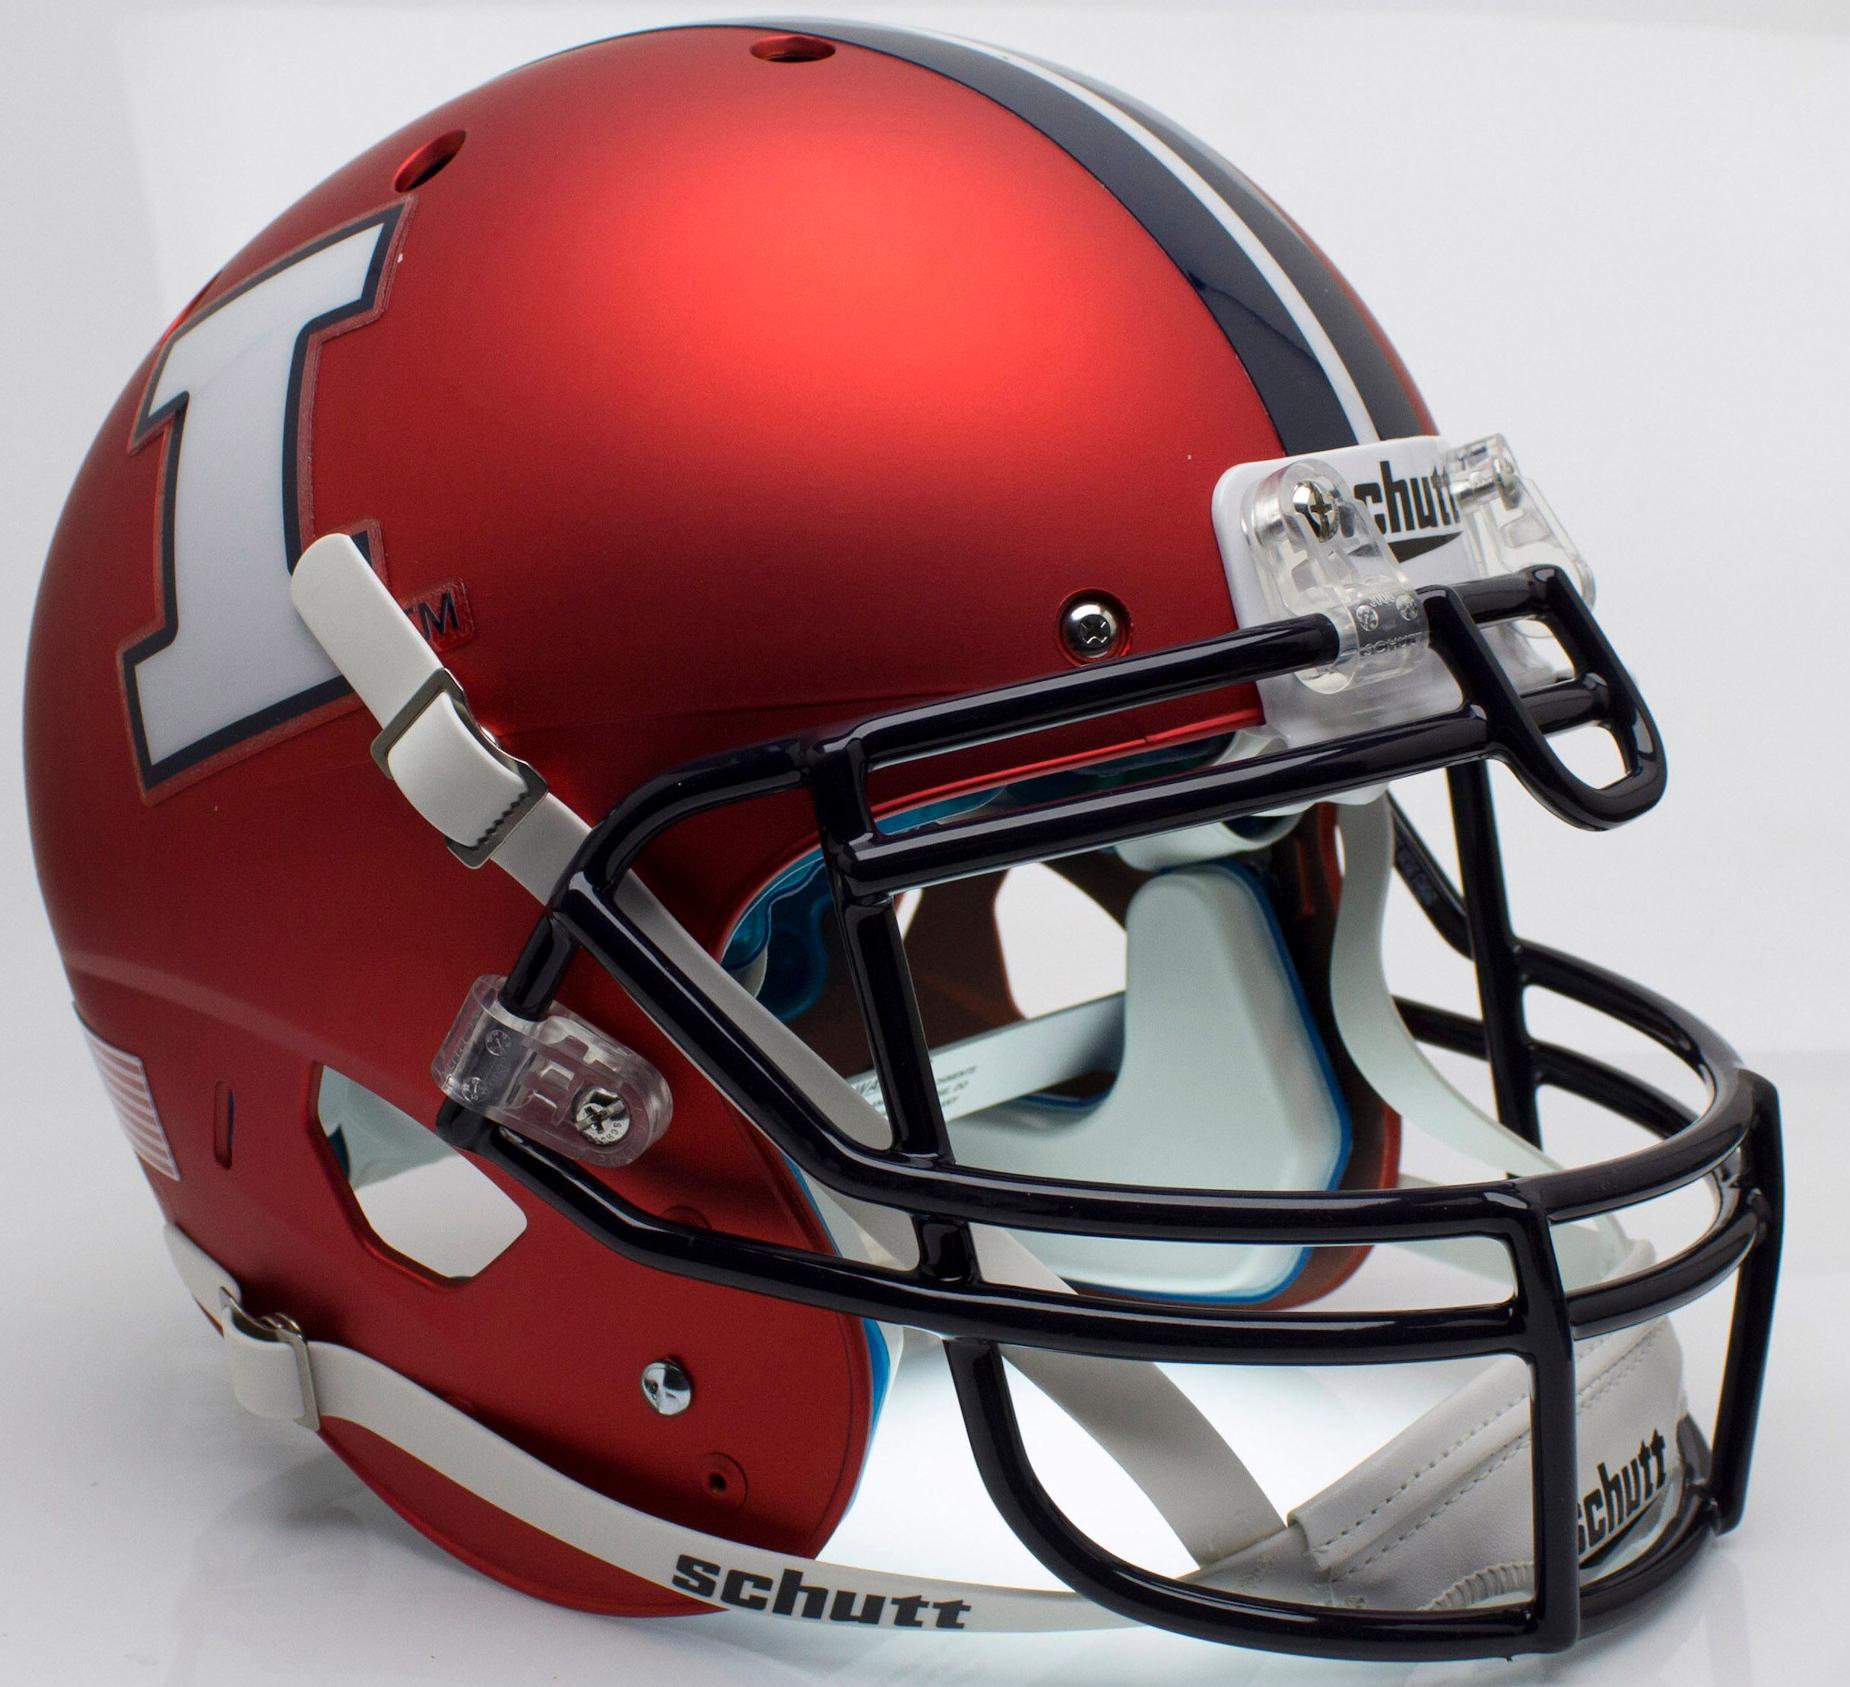 Illinois Fighting Illini Authentic College XP Football Helmet Schutt <B>Matte Orange</B>